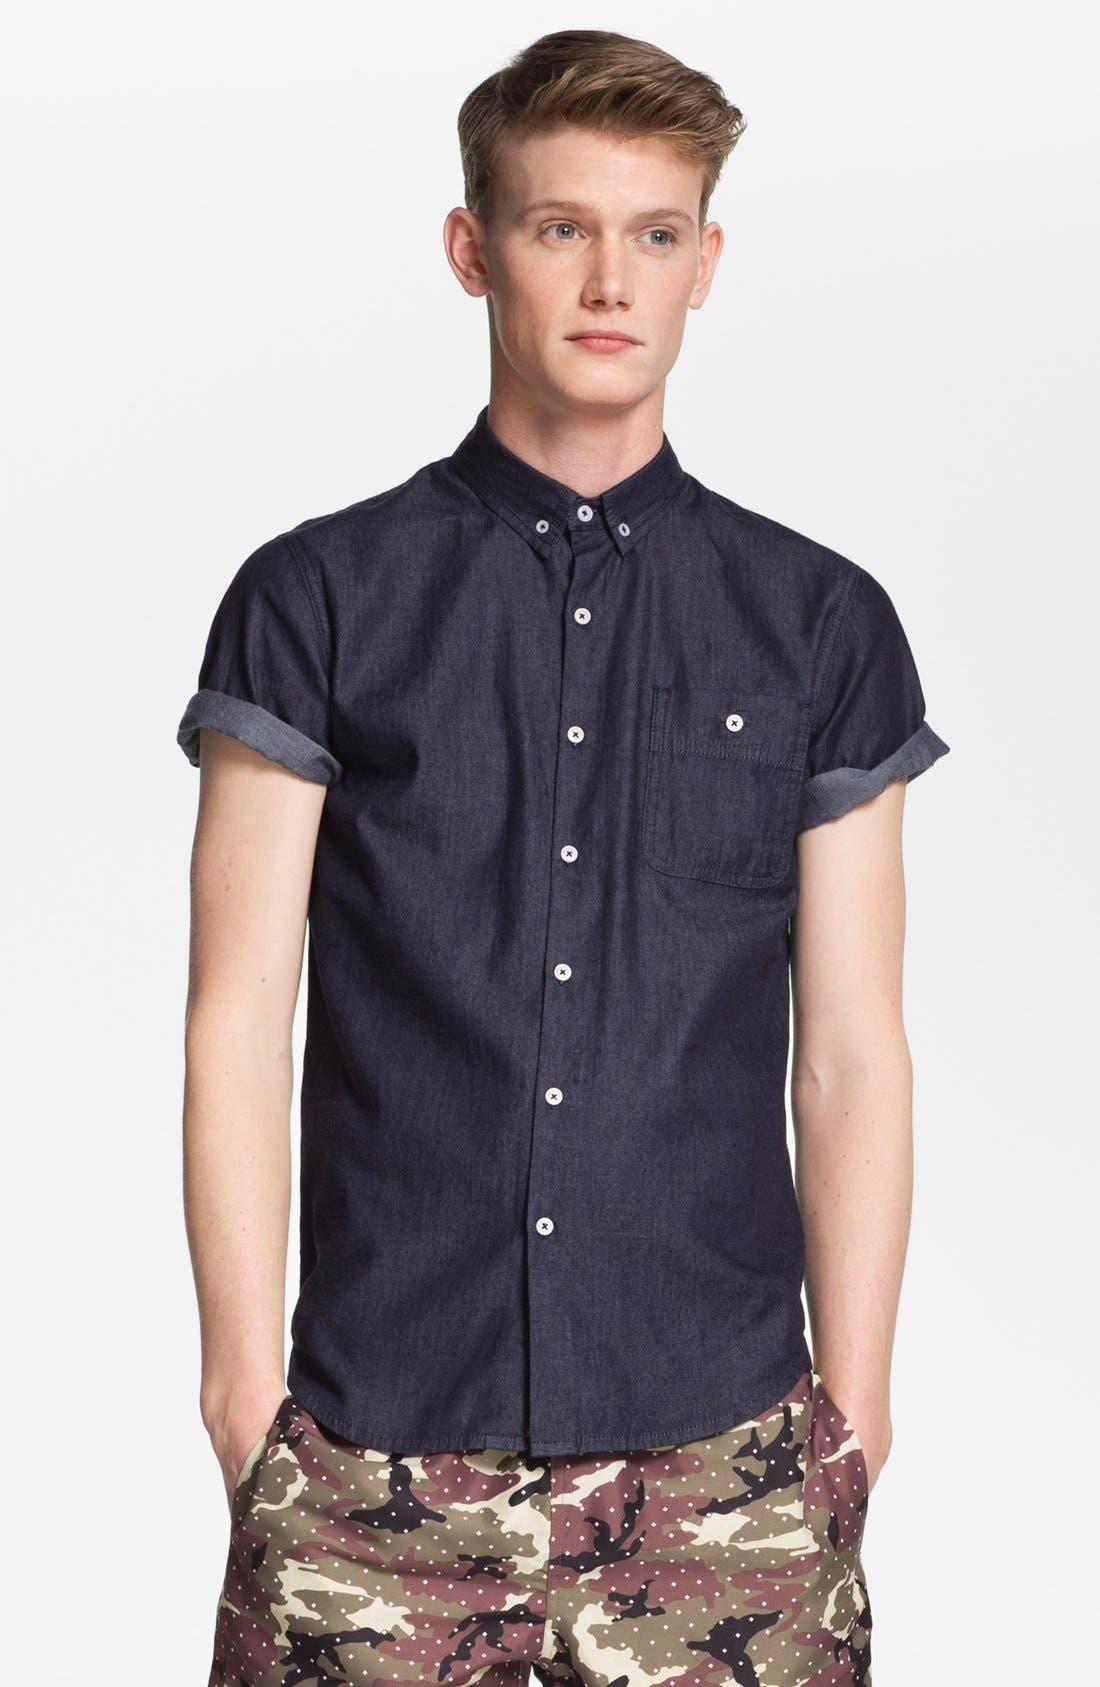 Alternate Image 1 Selected - Topman 'Smart' Short Sleeve Chambray Denim Shirt